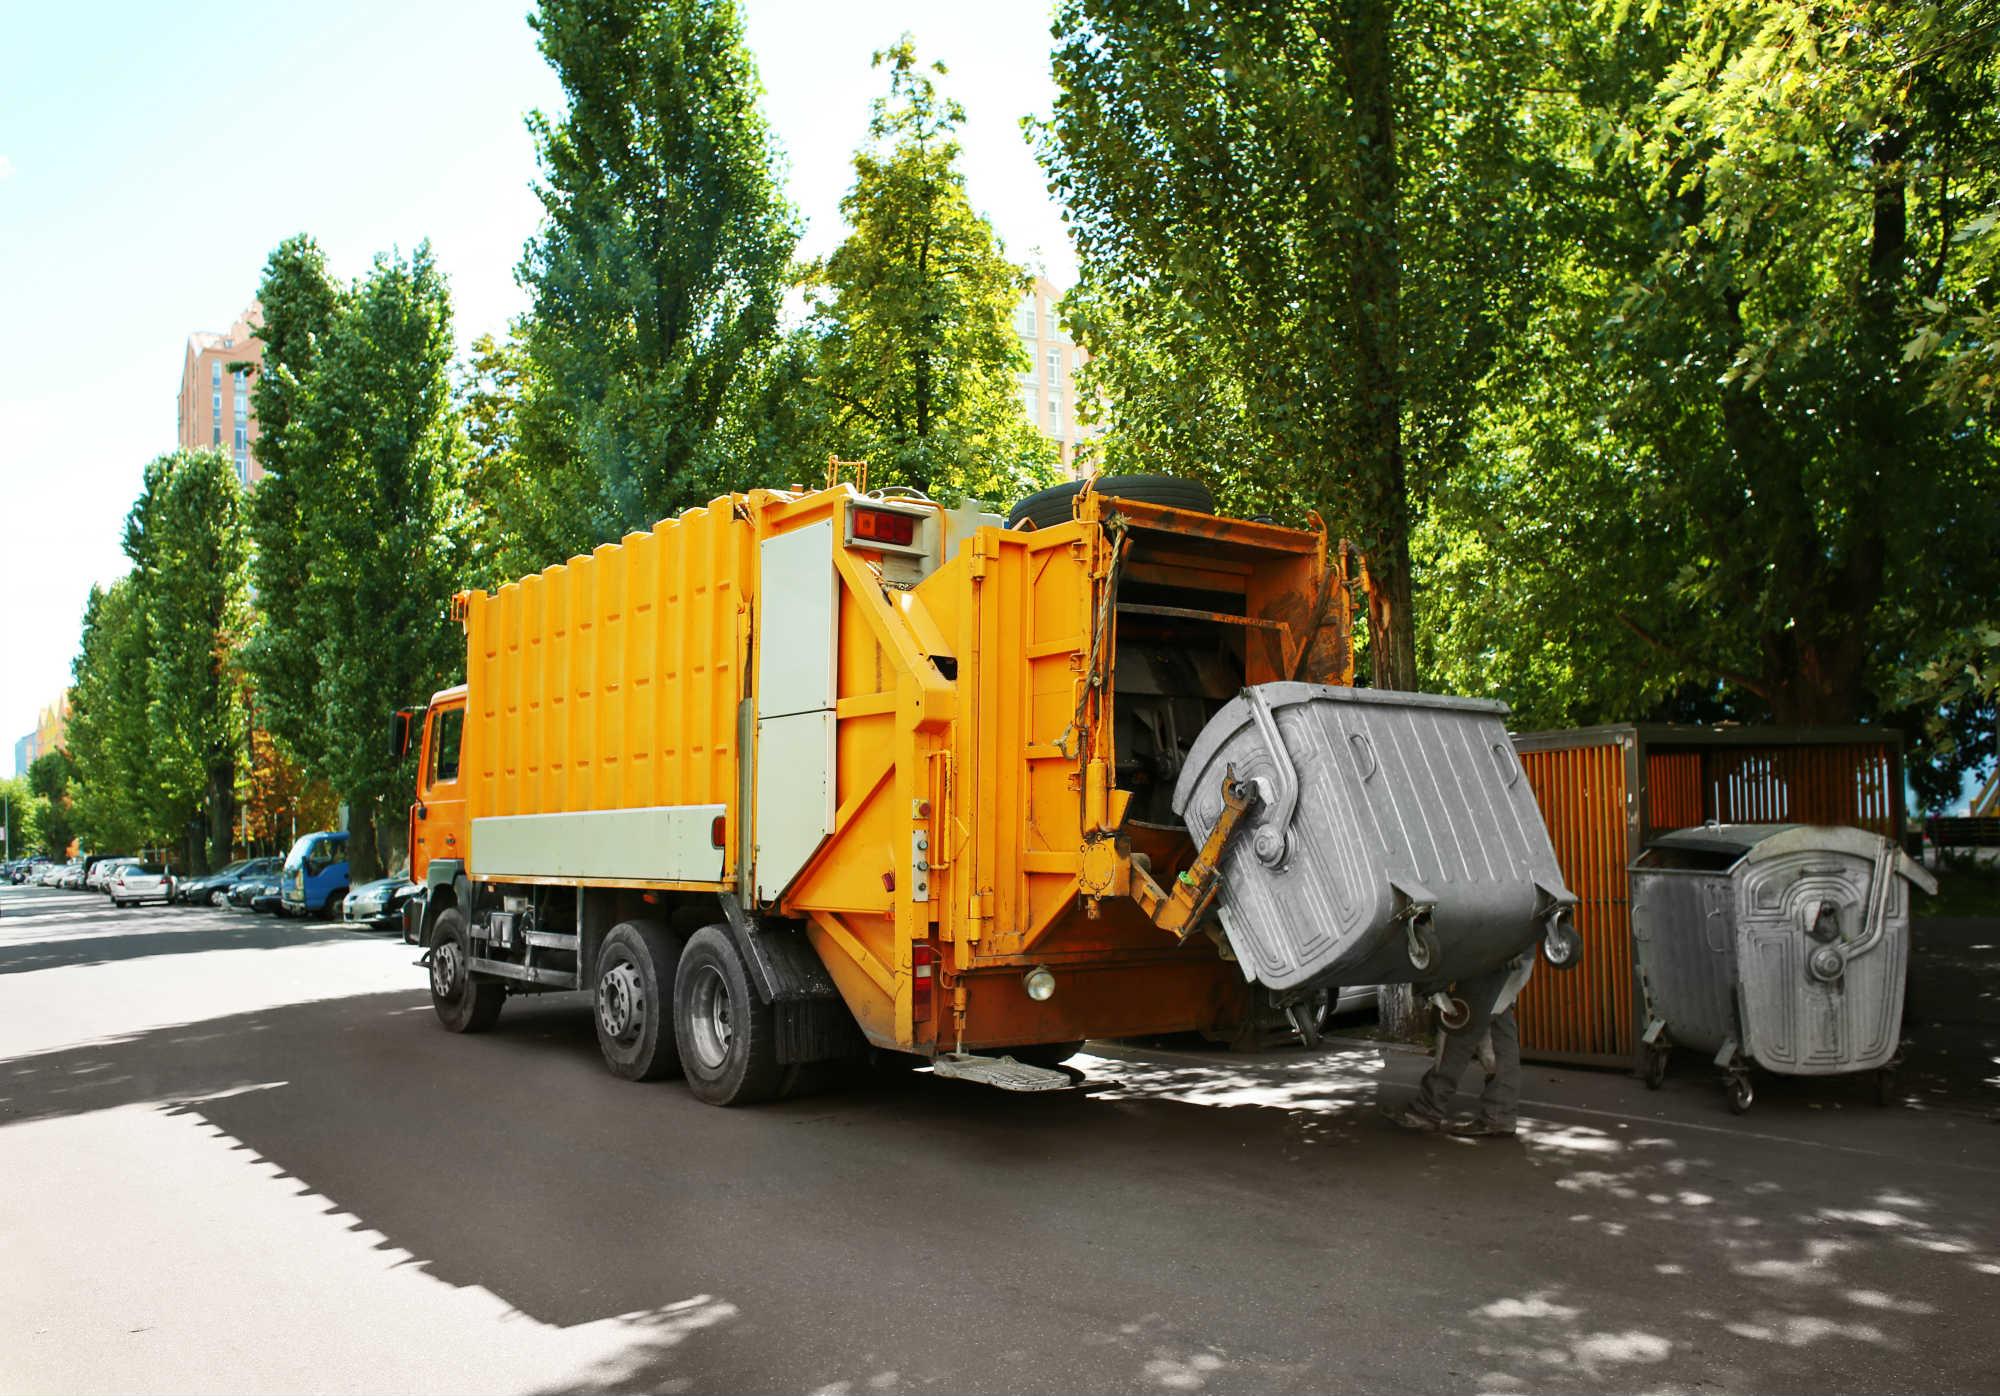 21 ciudades del mundo firmaron compromiso para disminuir residuos sólidos